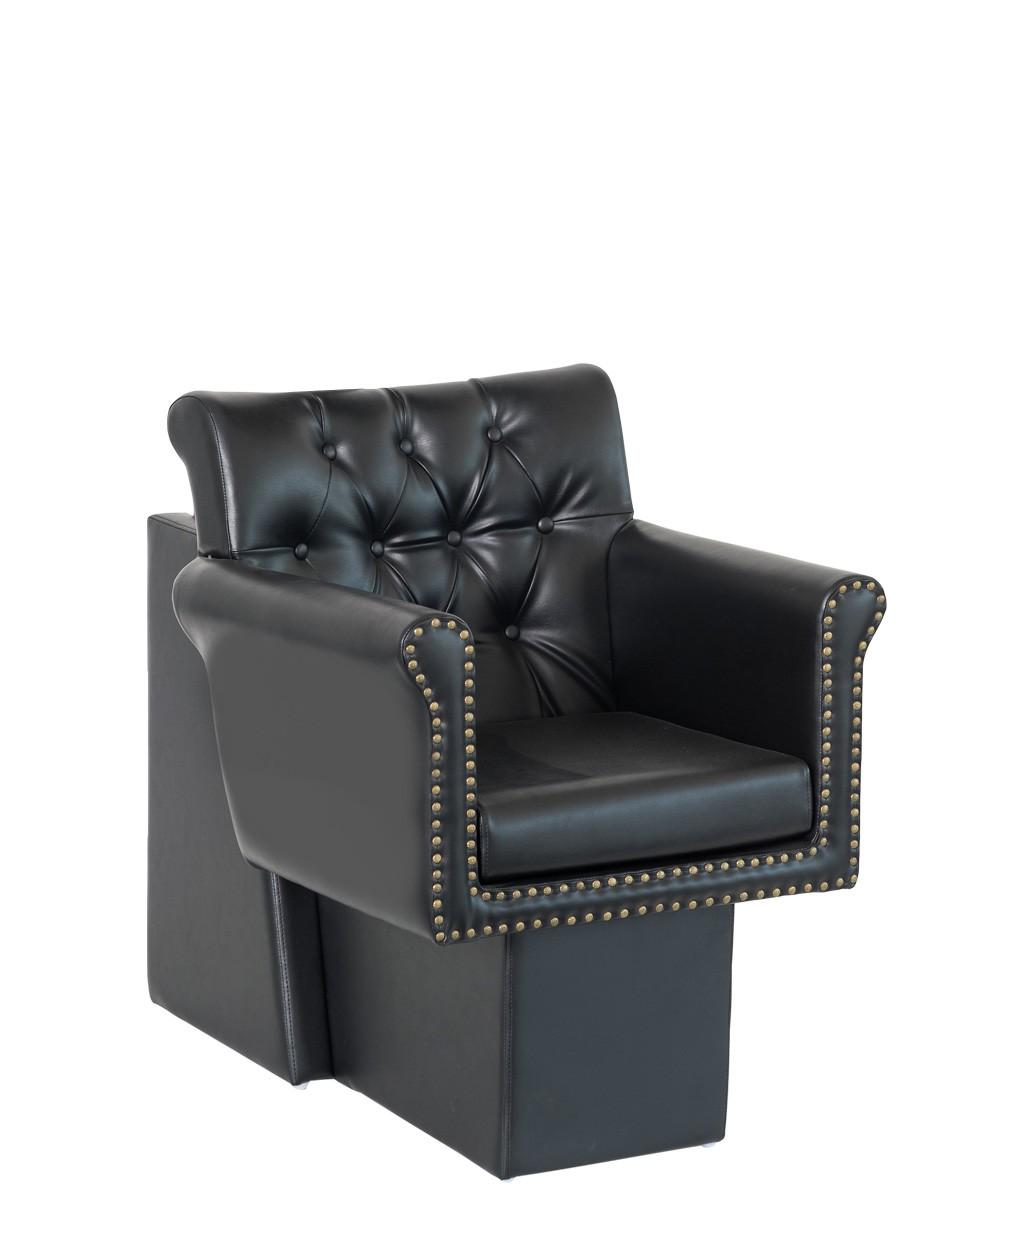 Chelsea Dryer Chair